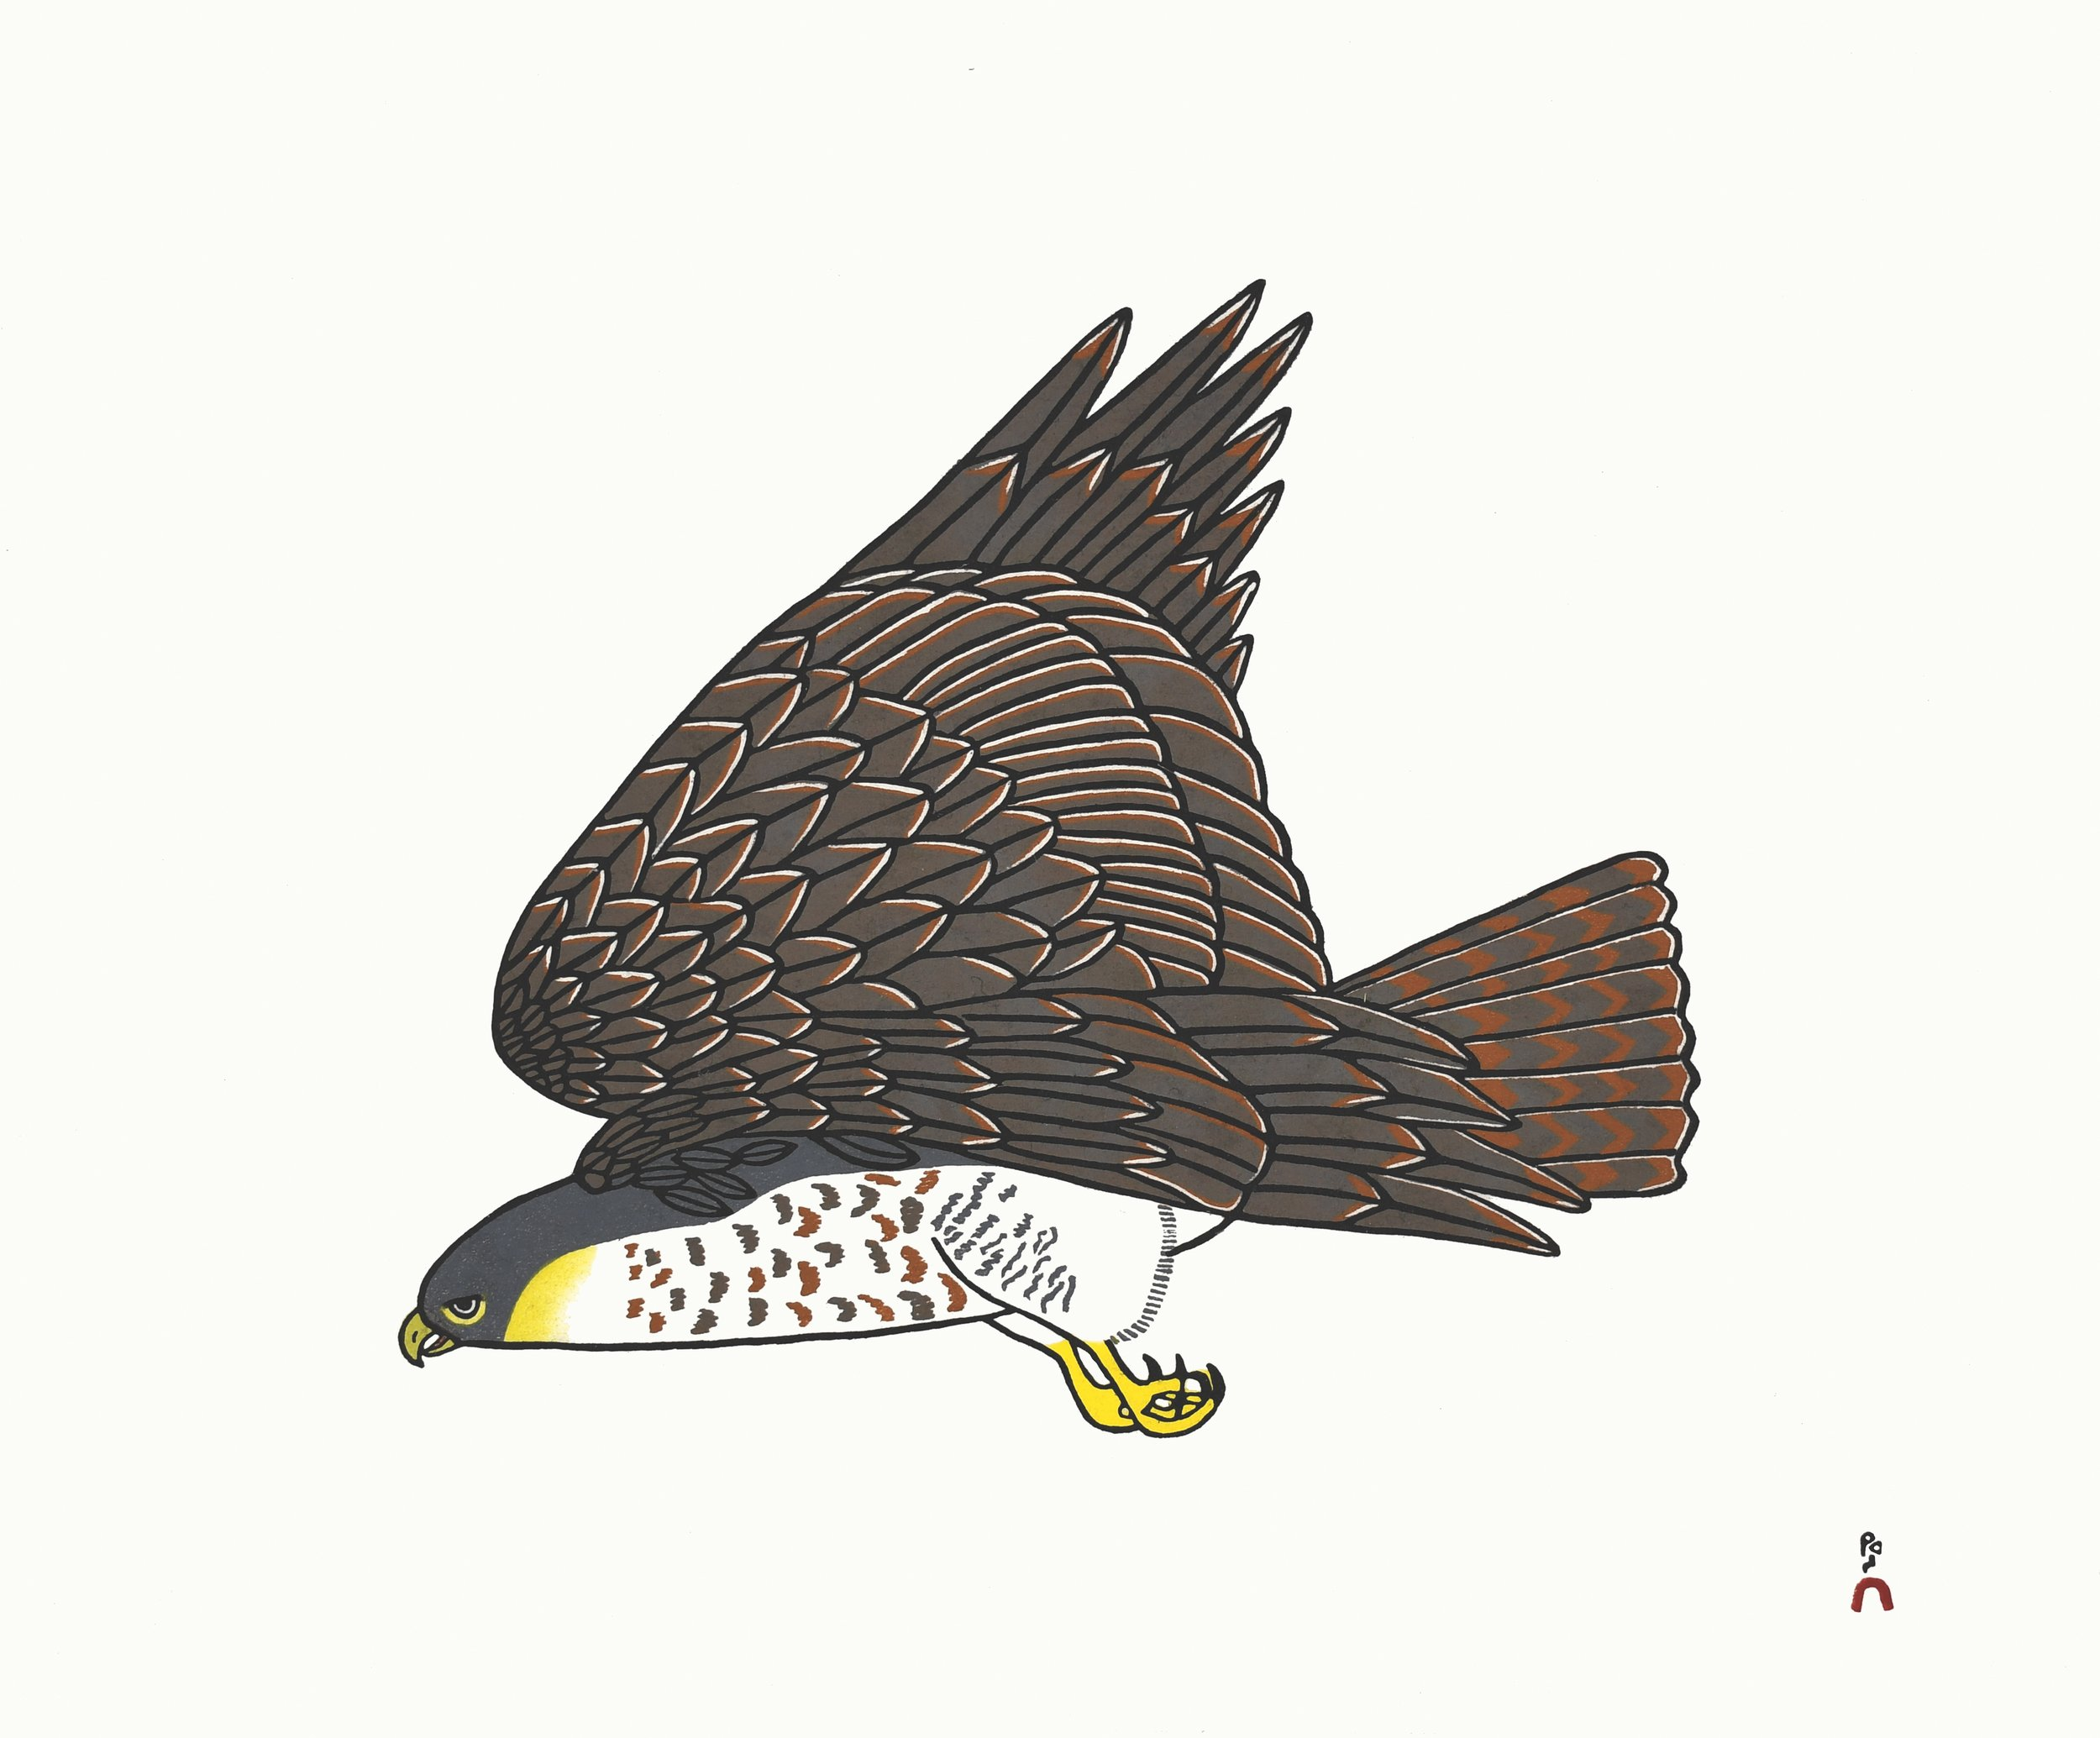 PAUOJOUNGIE SAGGIAK   1. Peregrine Falcon   Stonecut  Paper: Kizuki Kozo White  Printer: Qiatsuq Niviaqsi  45.8 x 55.5 cm  $ 500